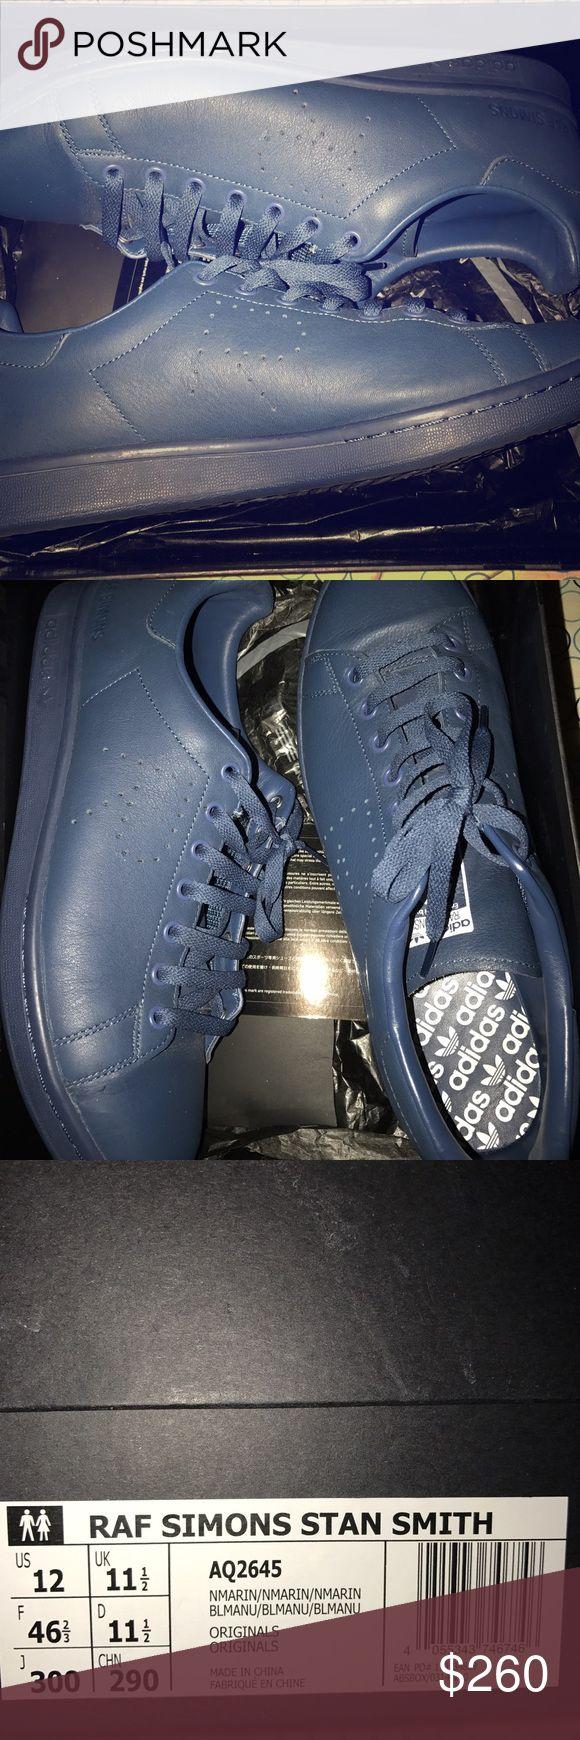 Raf Simons Stan Smith adidas Like new adidas good perfect shape not damaged at all Raf Simons Shoes Sneakers